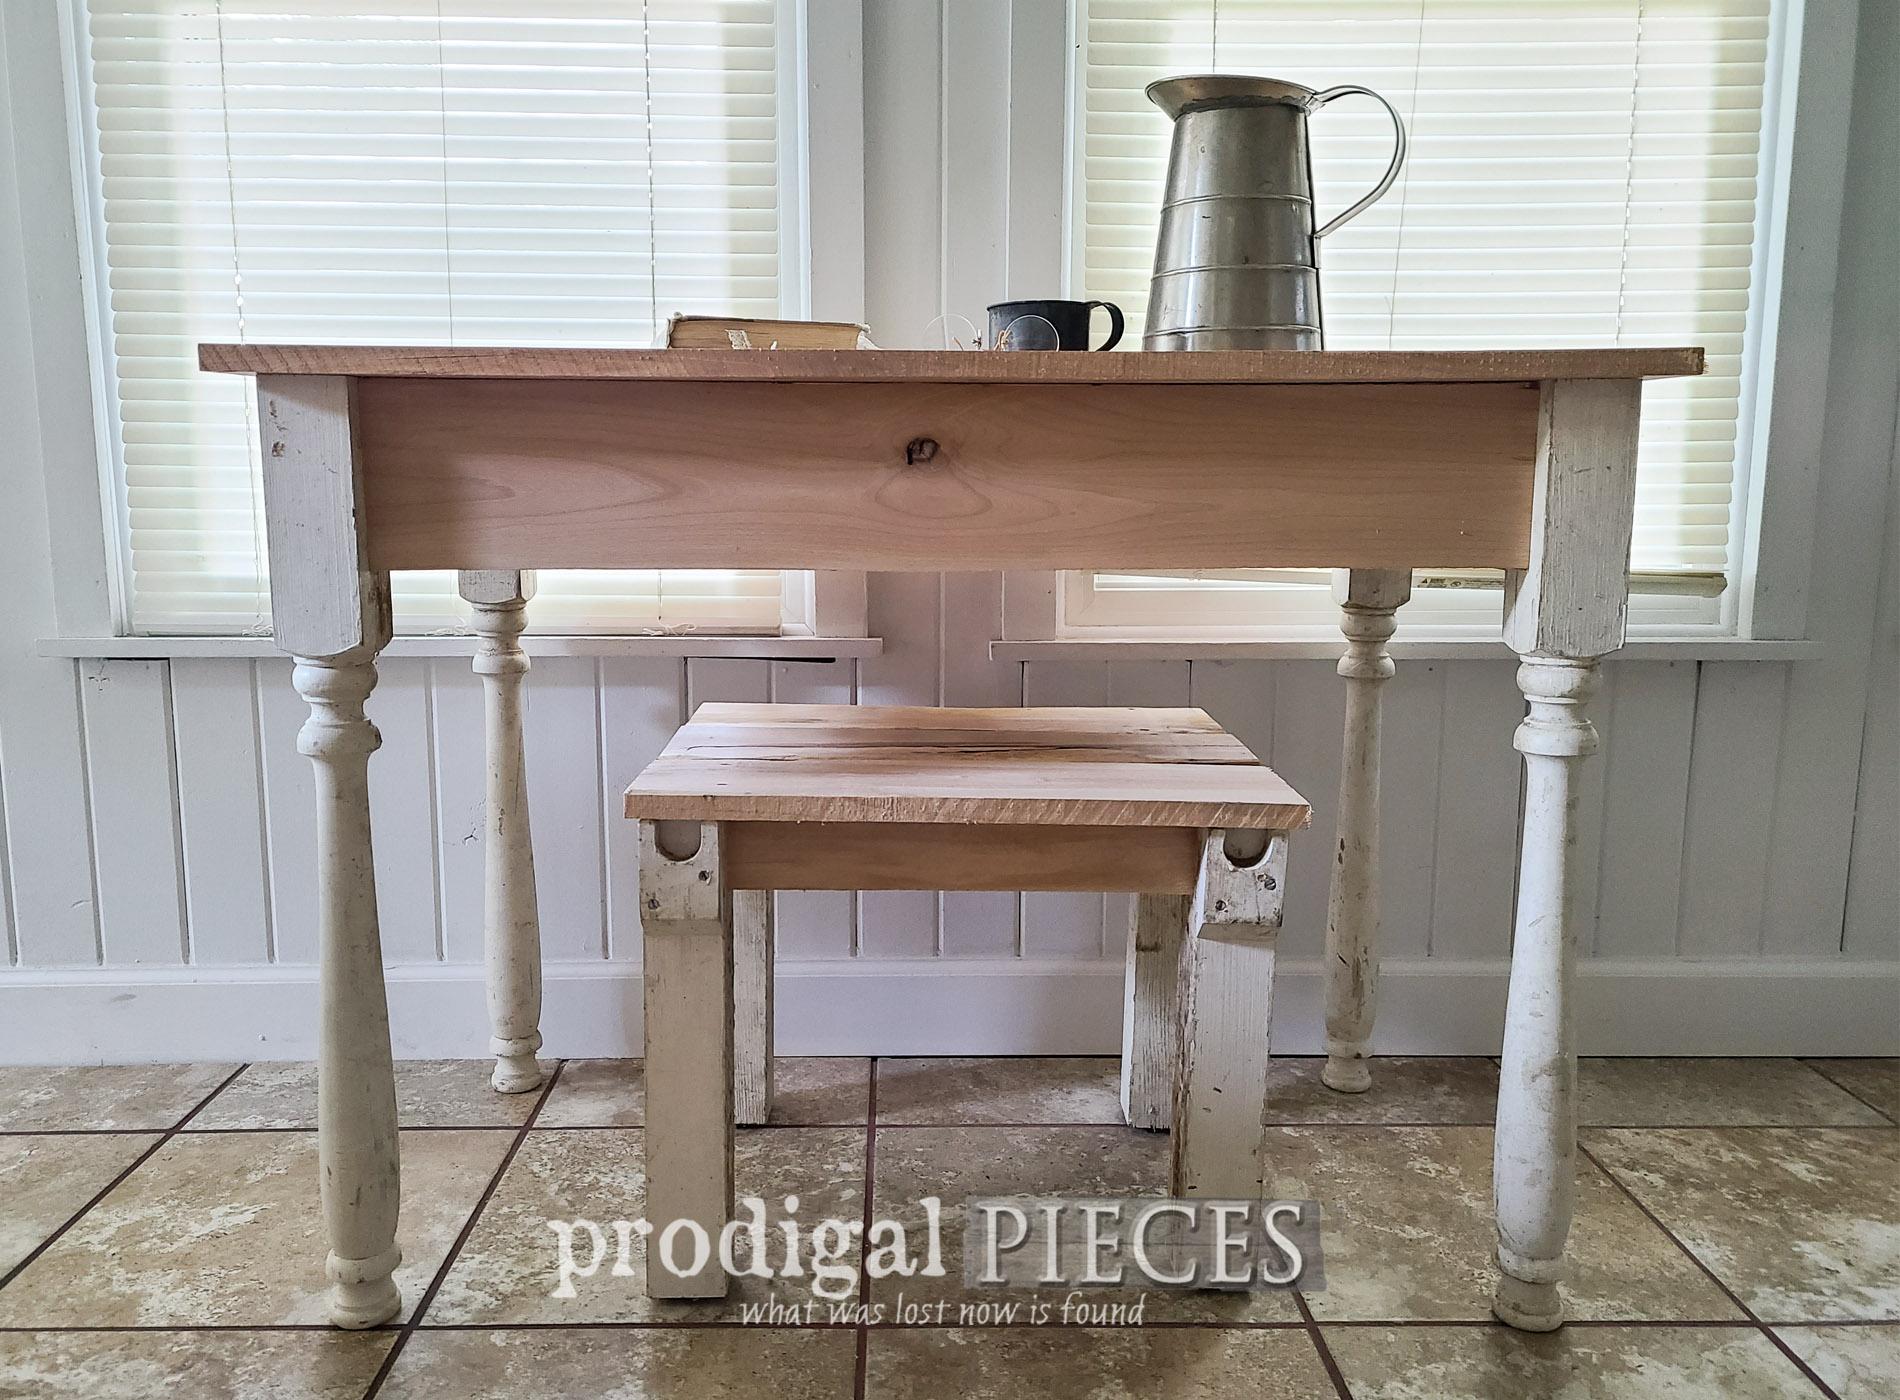 Featured Reclaimed Farmhouse Desk Set Built by Larissa of Prodigal Pieces | prodigalpieces.com #prodigalpieces #farmhouse #furniture #home #homedecor